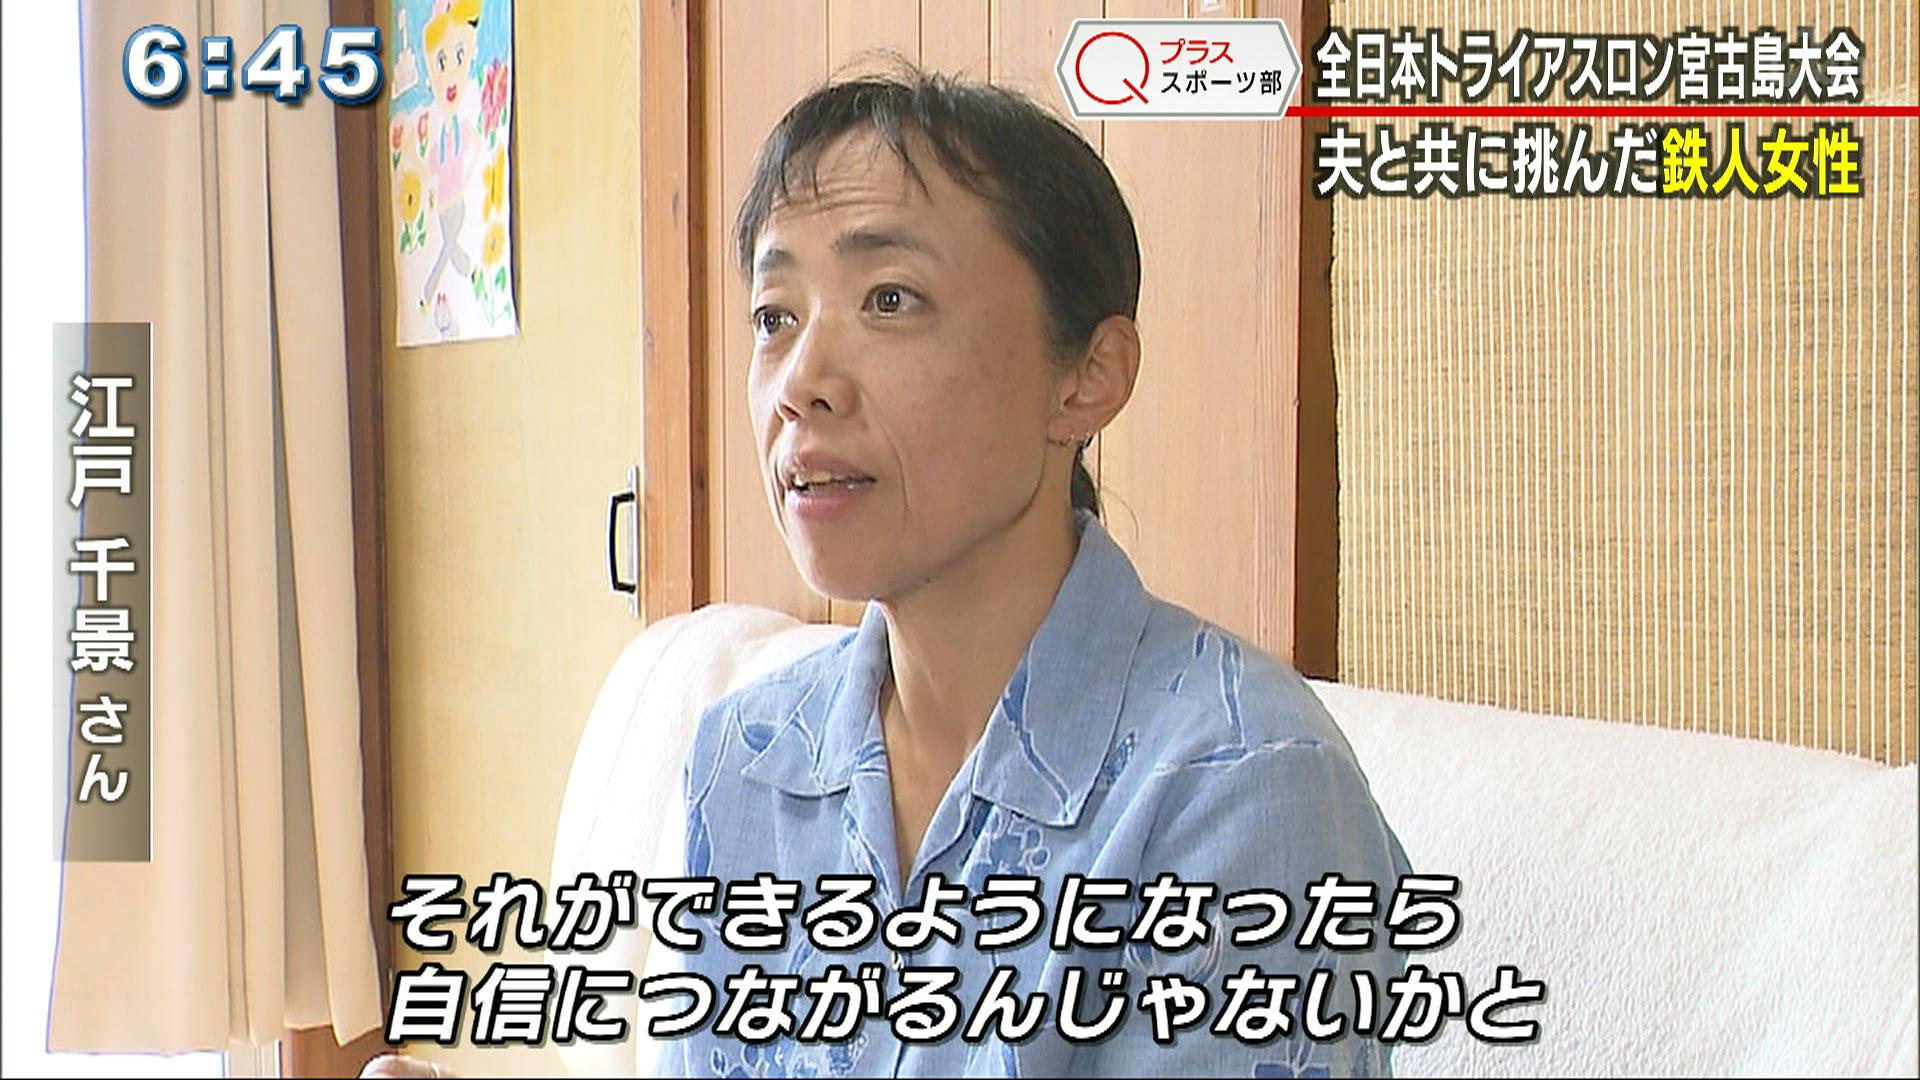 Qプラススポーツ部 第35回全日本トライアスロン宮古島大会